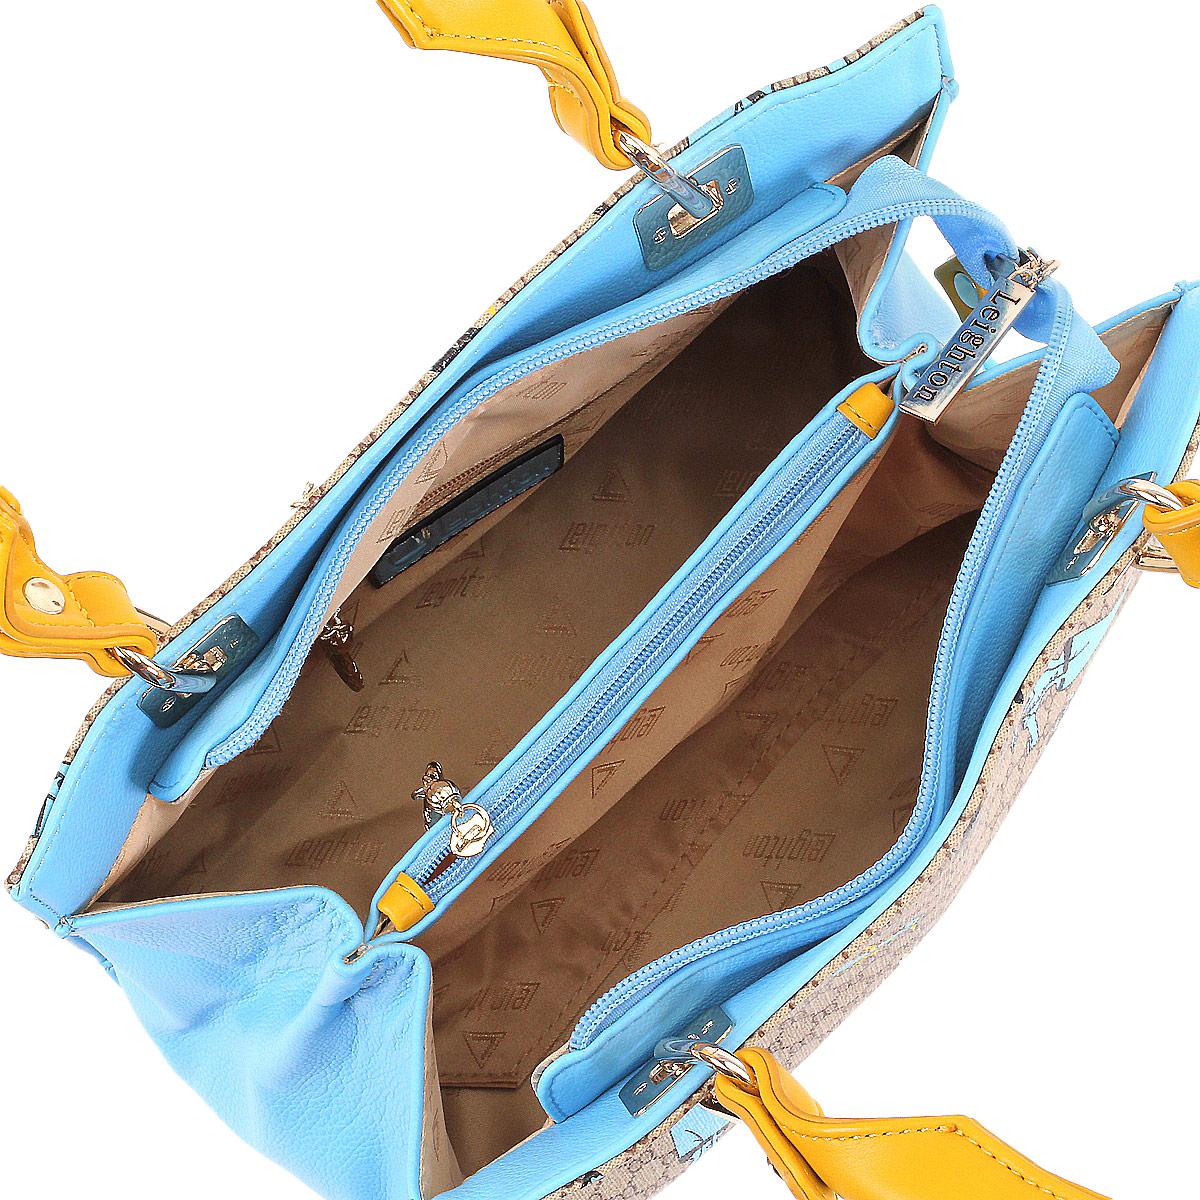 Сумка женская Leighton, цвет: бежевый, голубой. 560322-7027 ( 560322-7027/2/1070/703/257/76 )